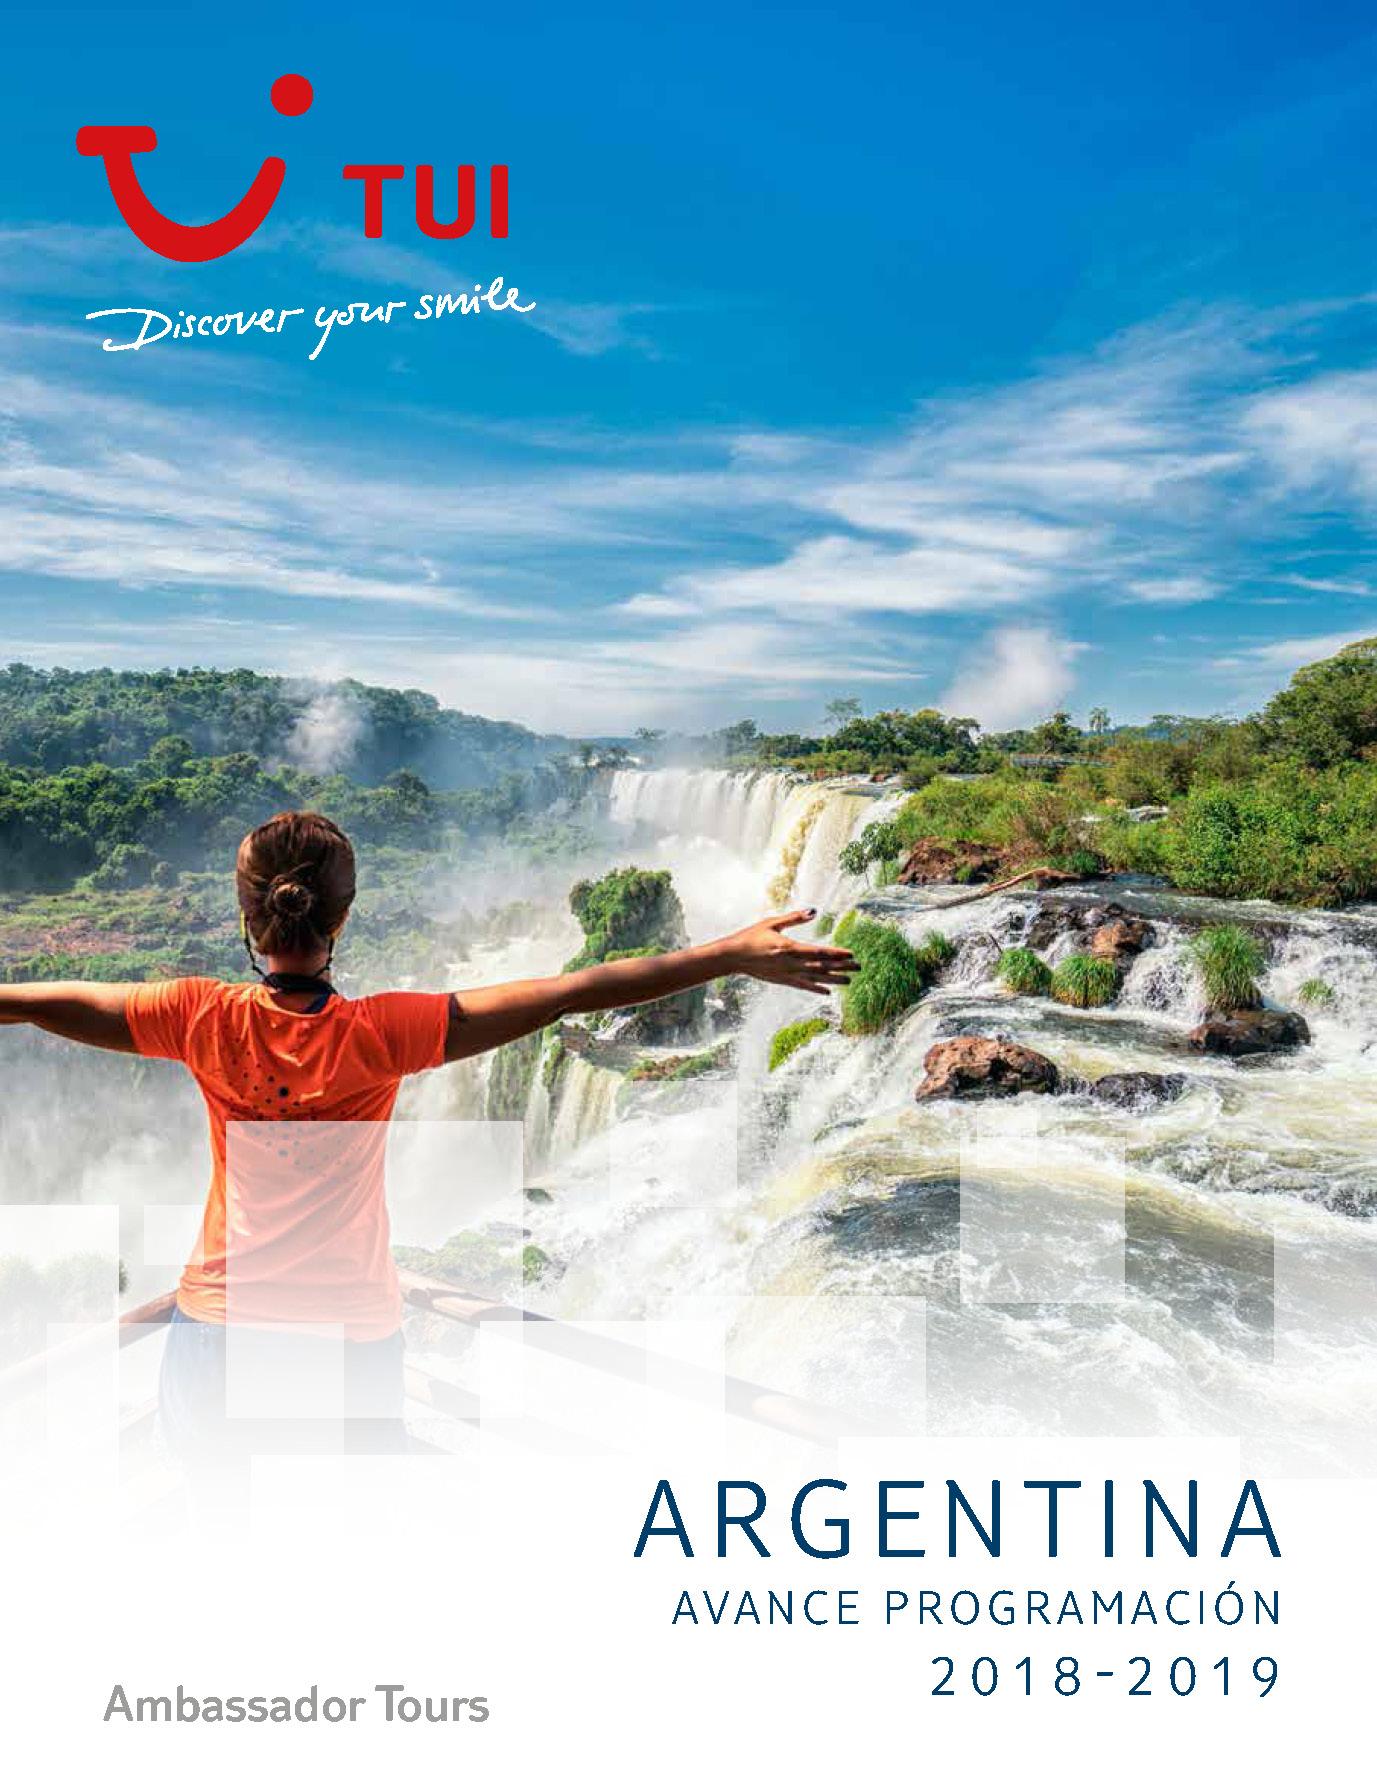 Catalogo TUI Ambassador Tours Avance Argentina 2018-2019